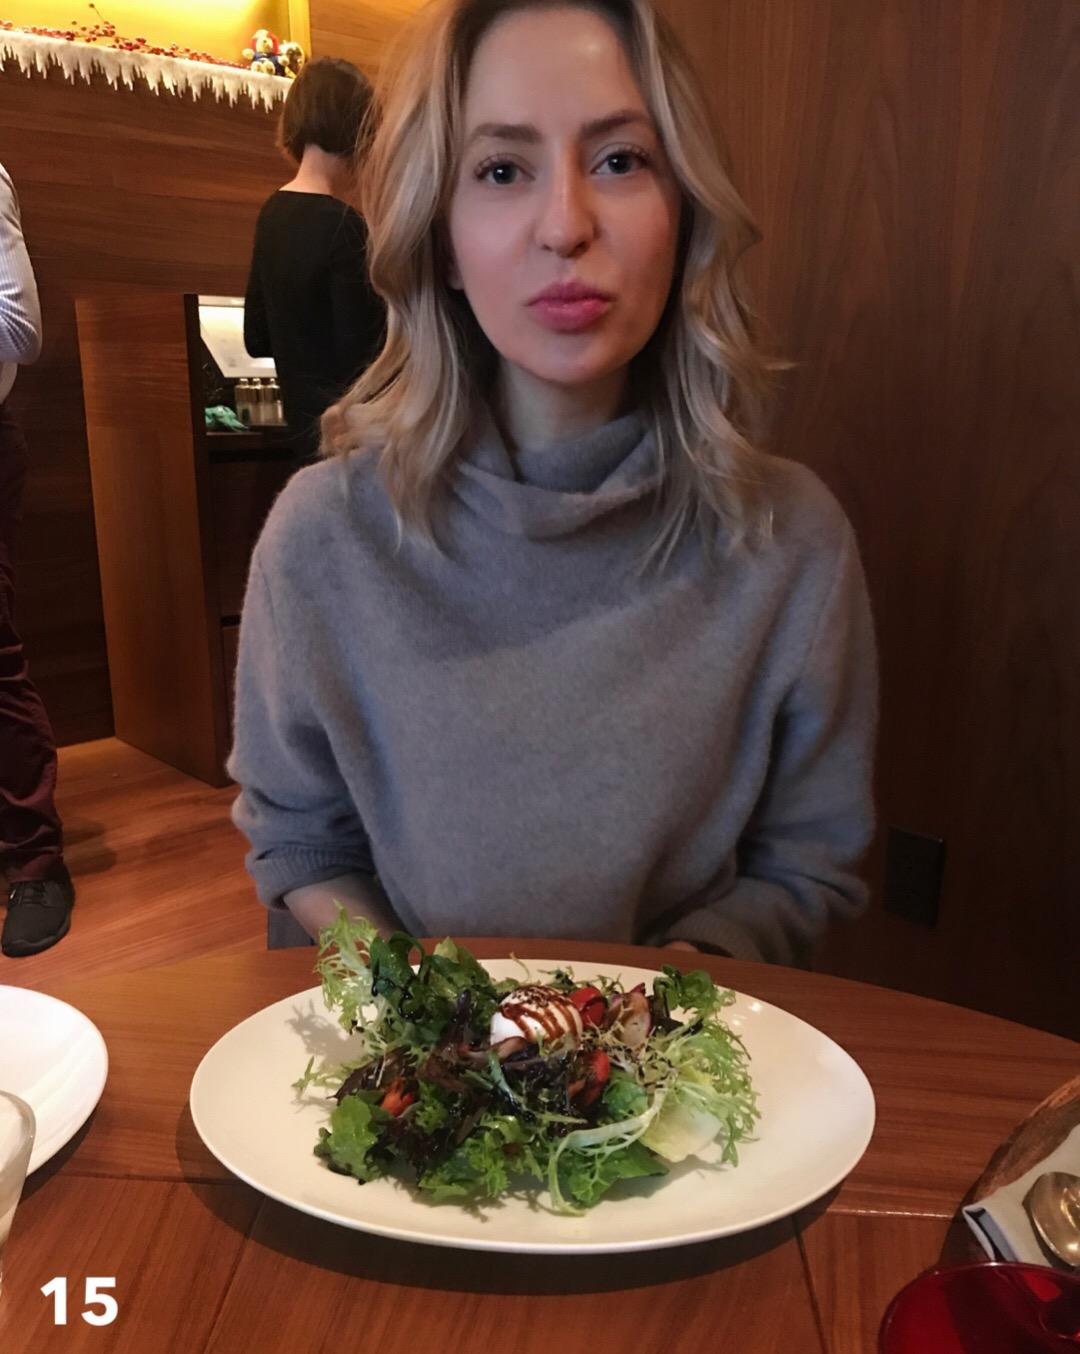 alyonka larionov food